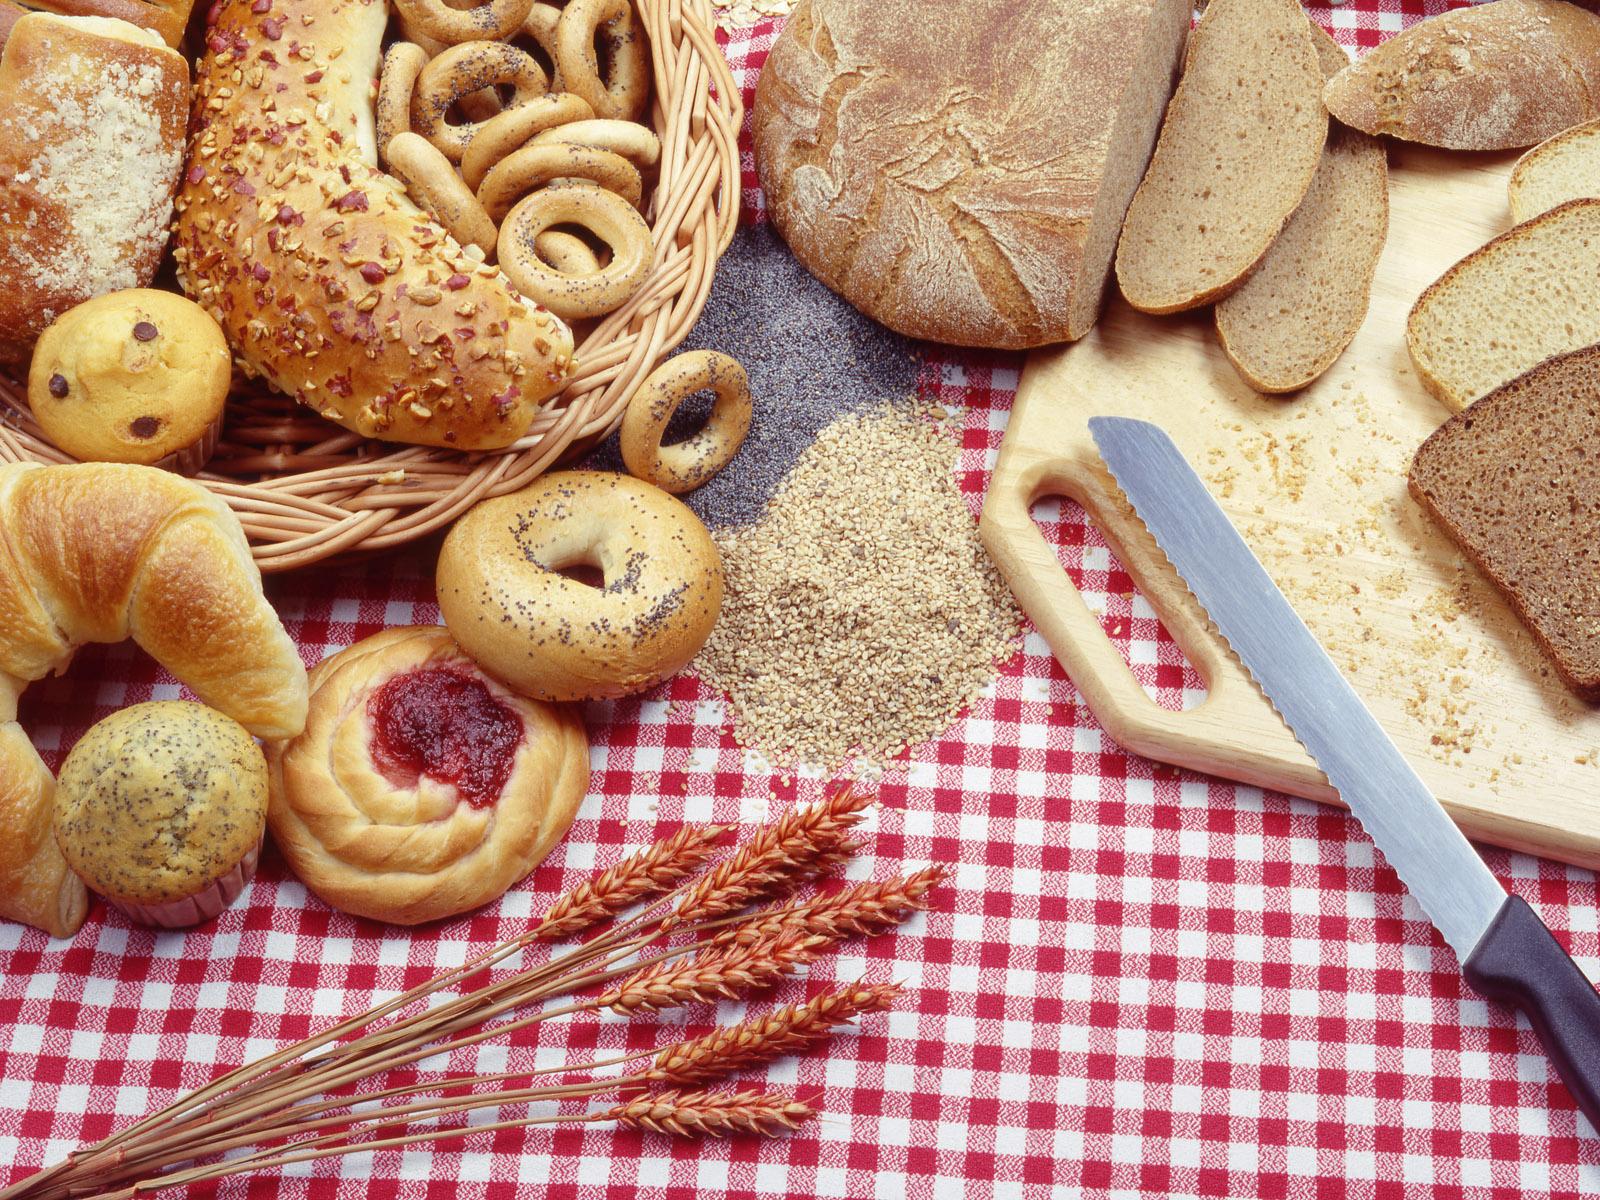 Картинки хлеба и тортов